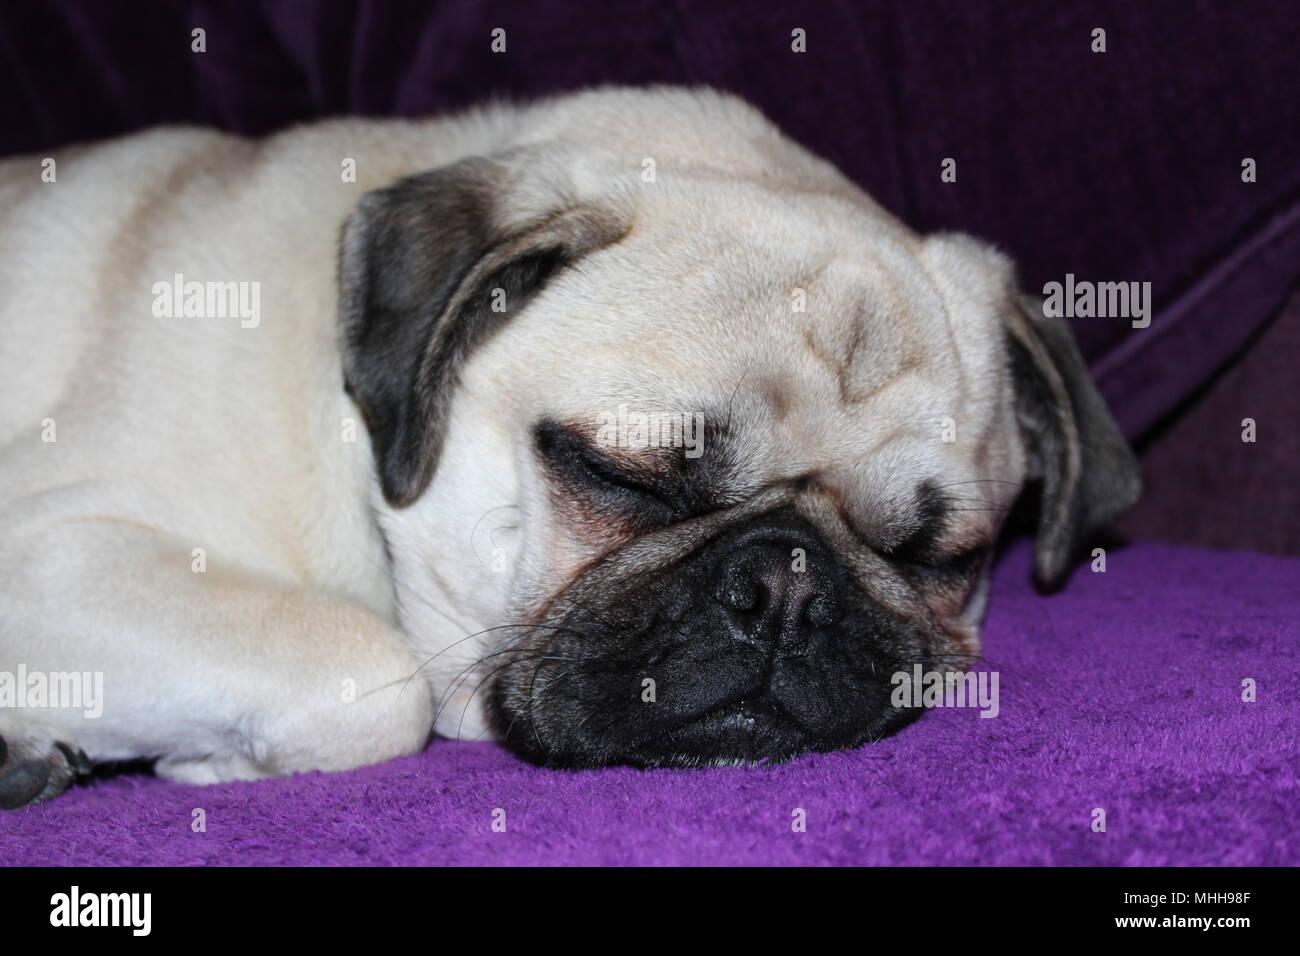 A one year old male Pug dog asleep - Stock Image